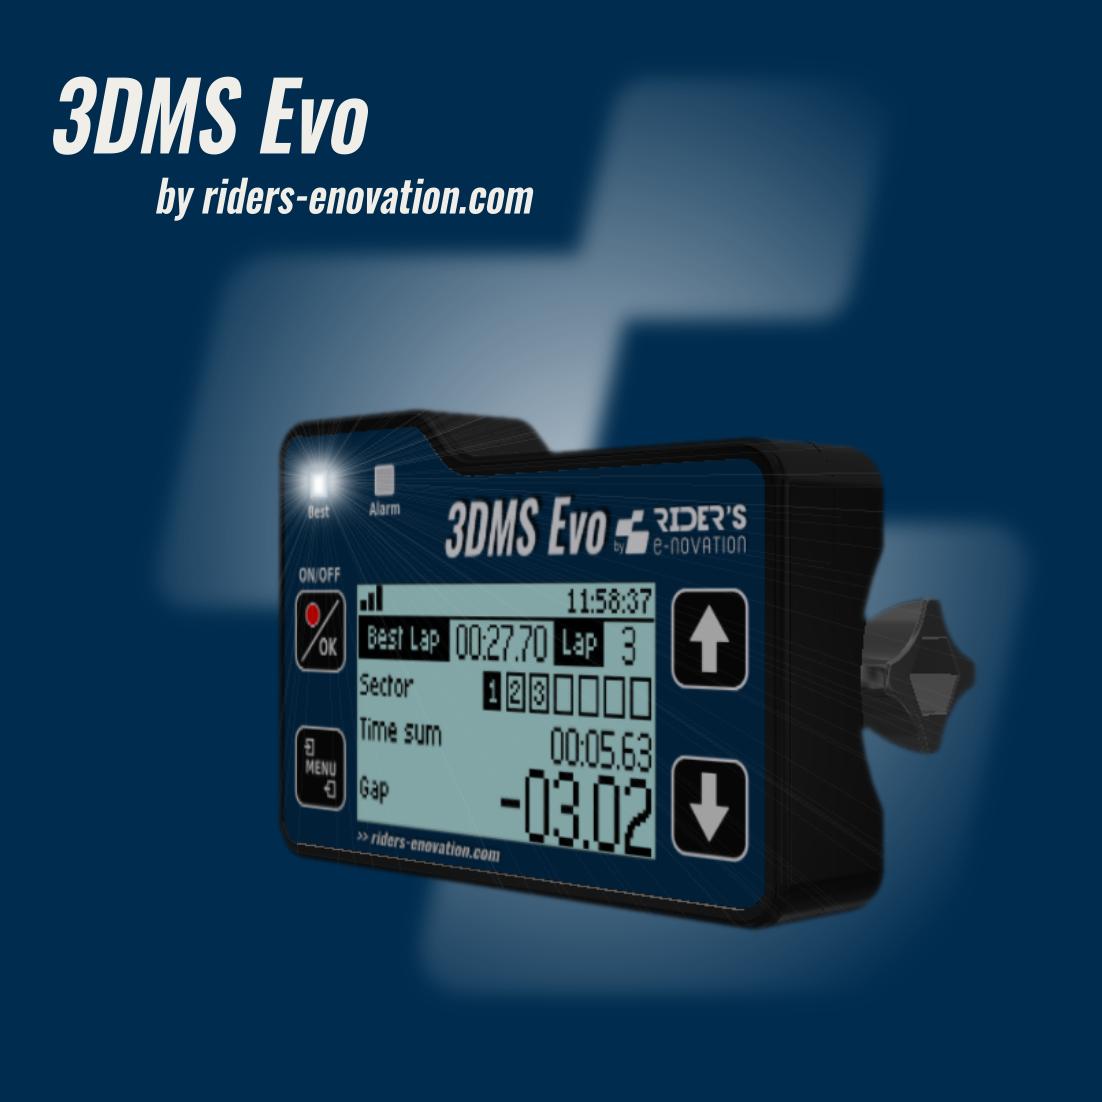 3DMS Evo revealed